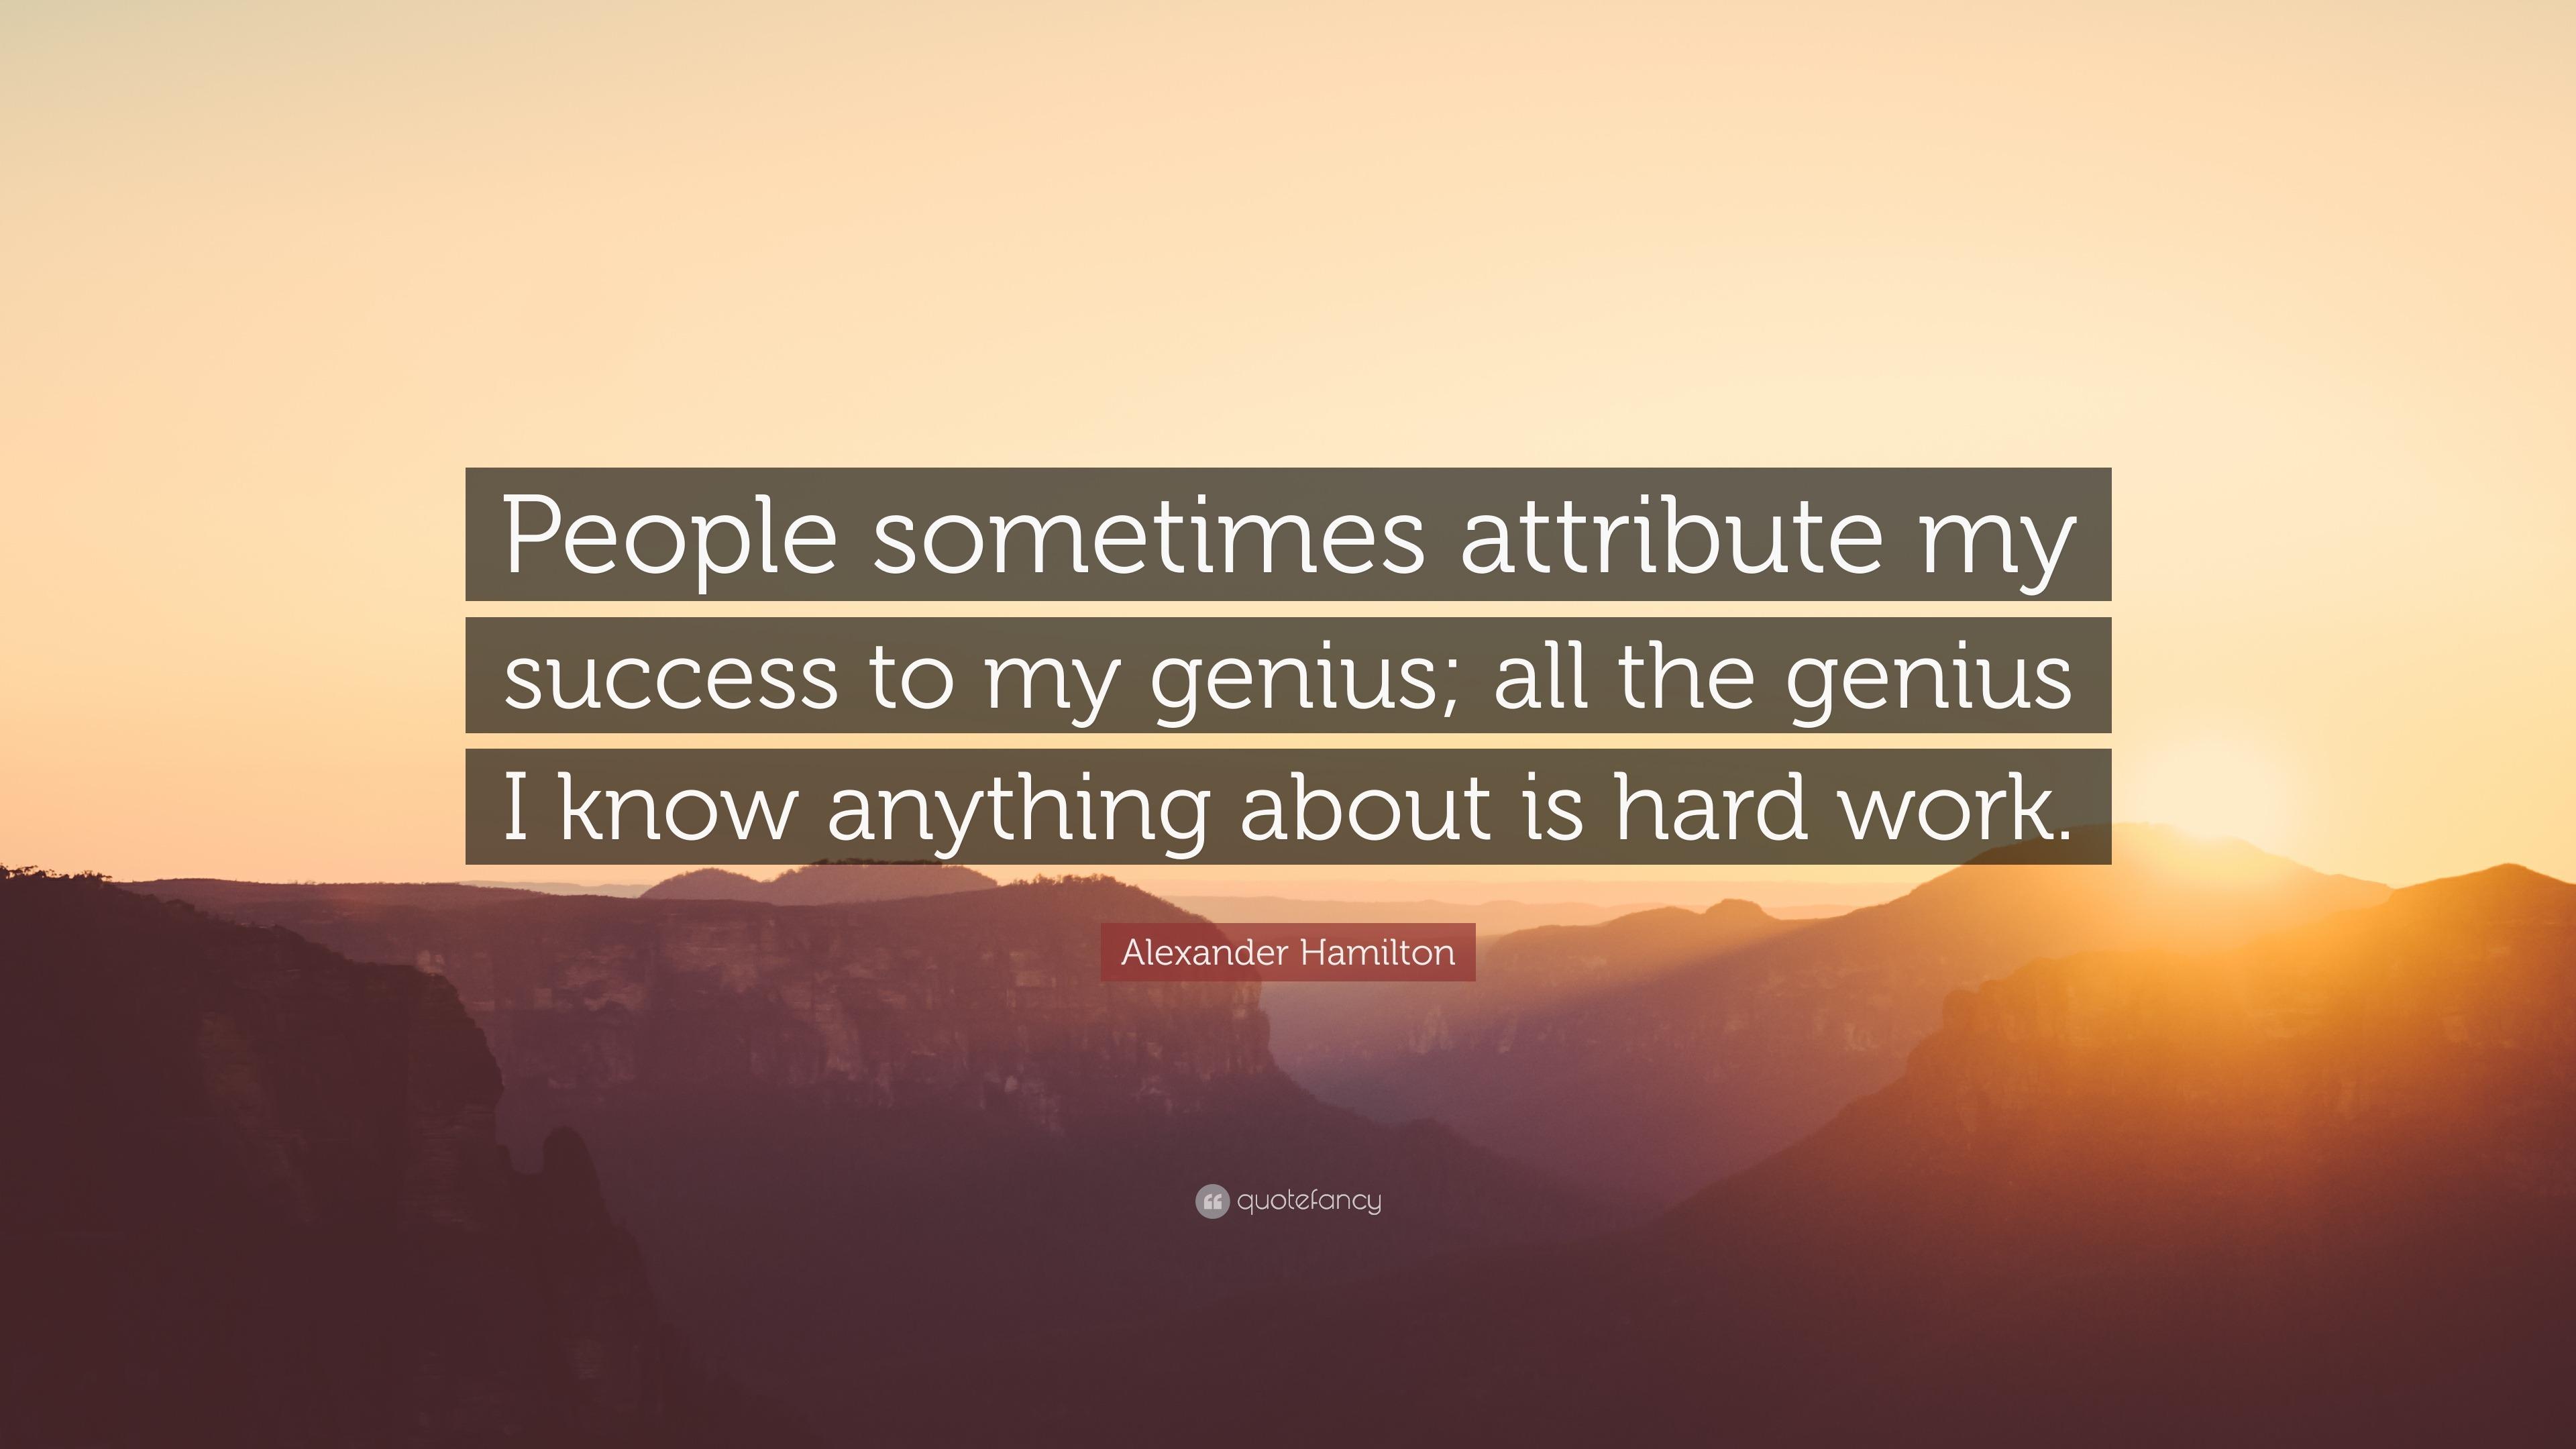 Hamilton Wallpaper Quotes Alexander Hamilton Quote People Sometimes Attribute My